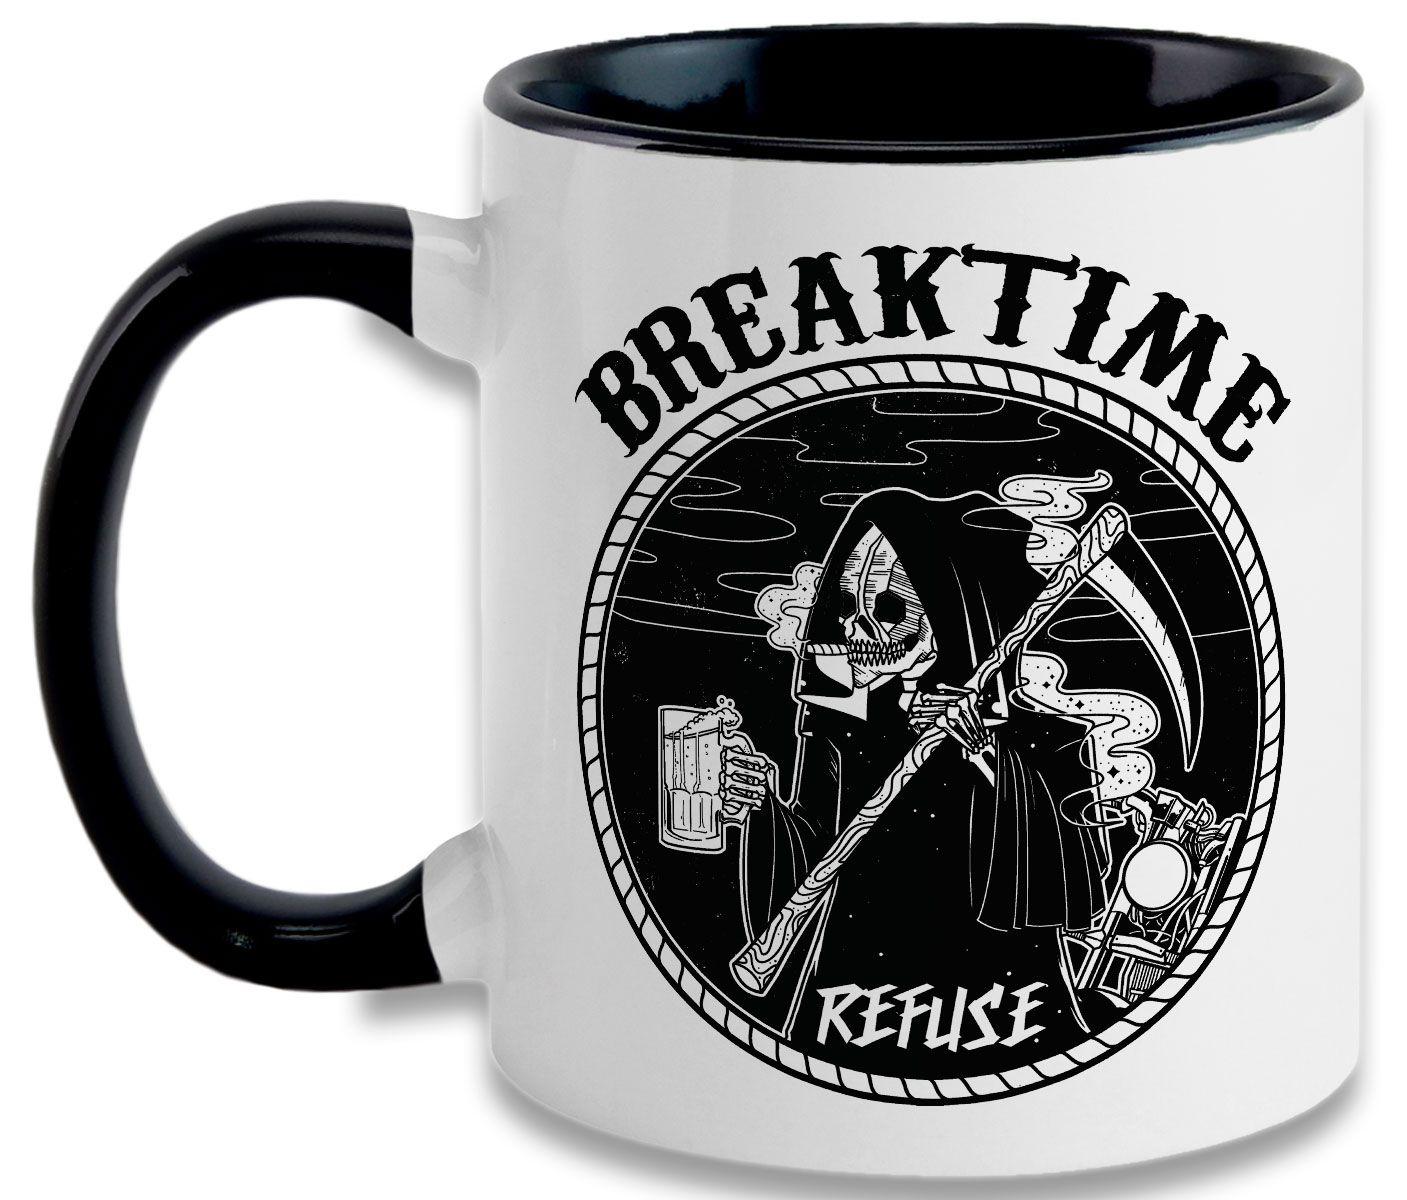 Caneca Breaktime